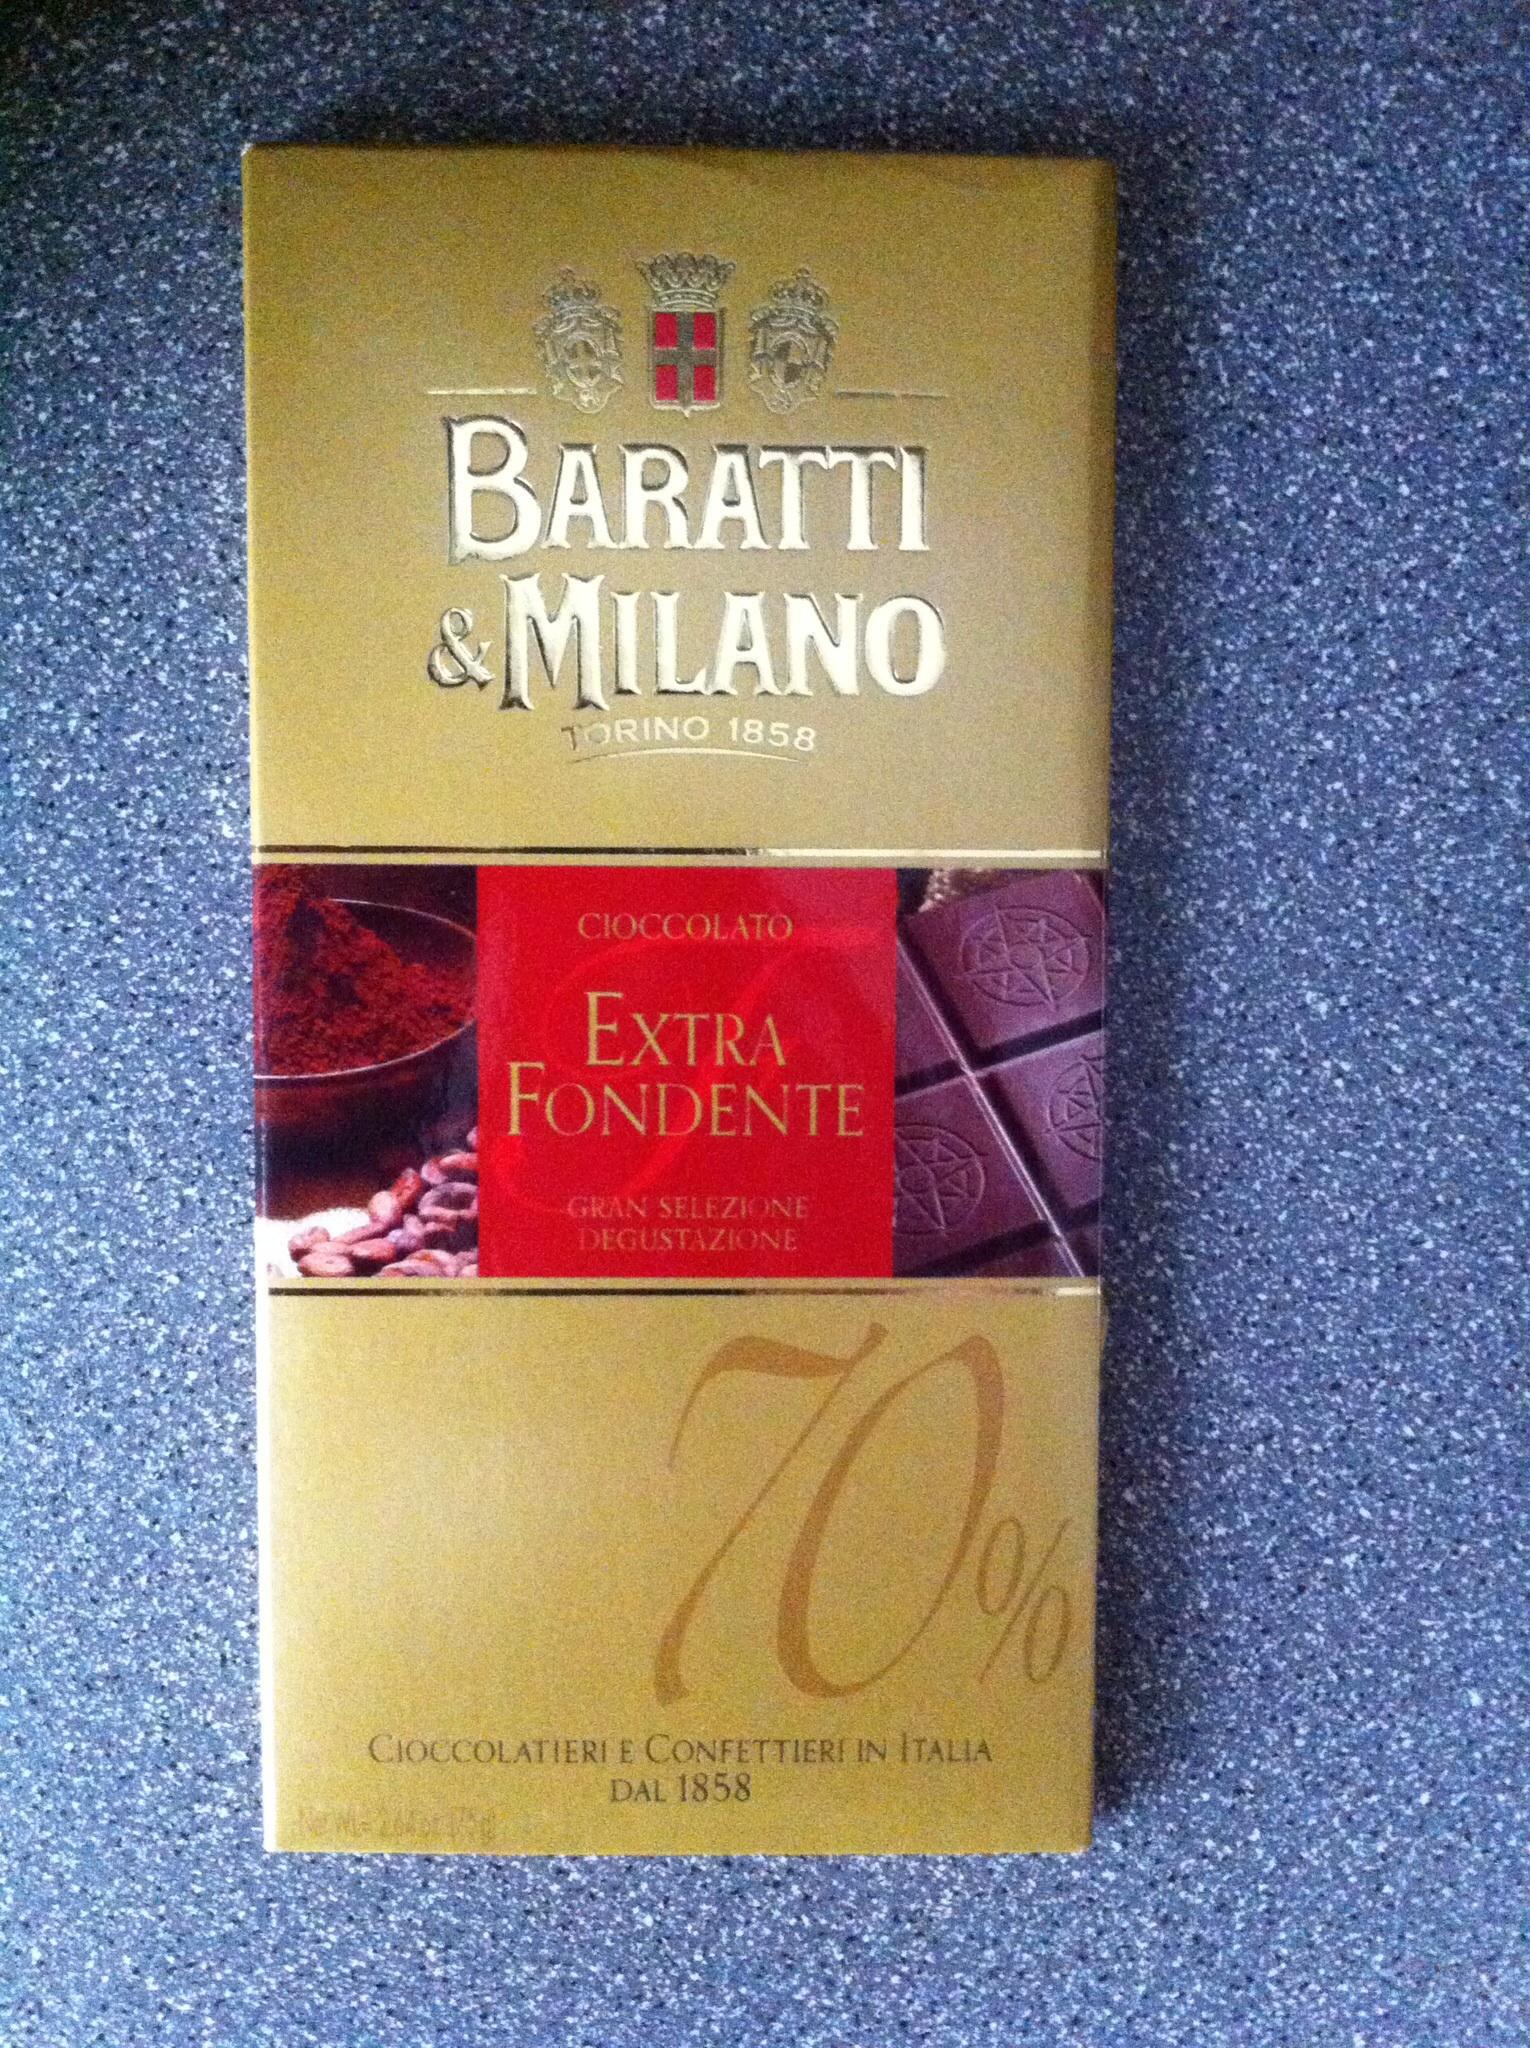 Italian 70% chocolate